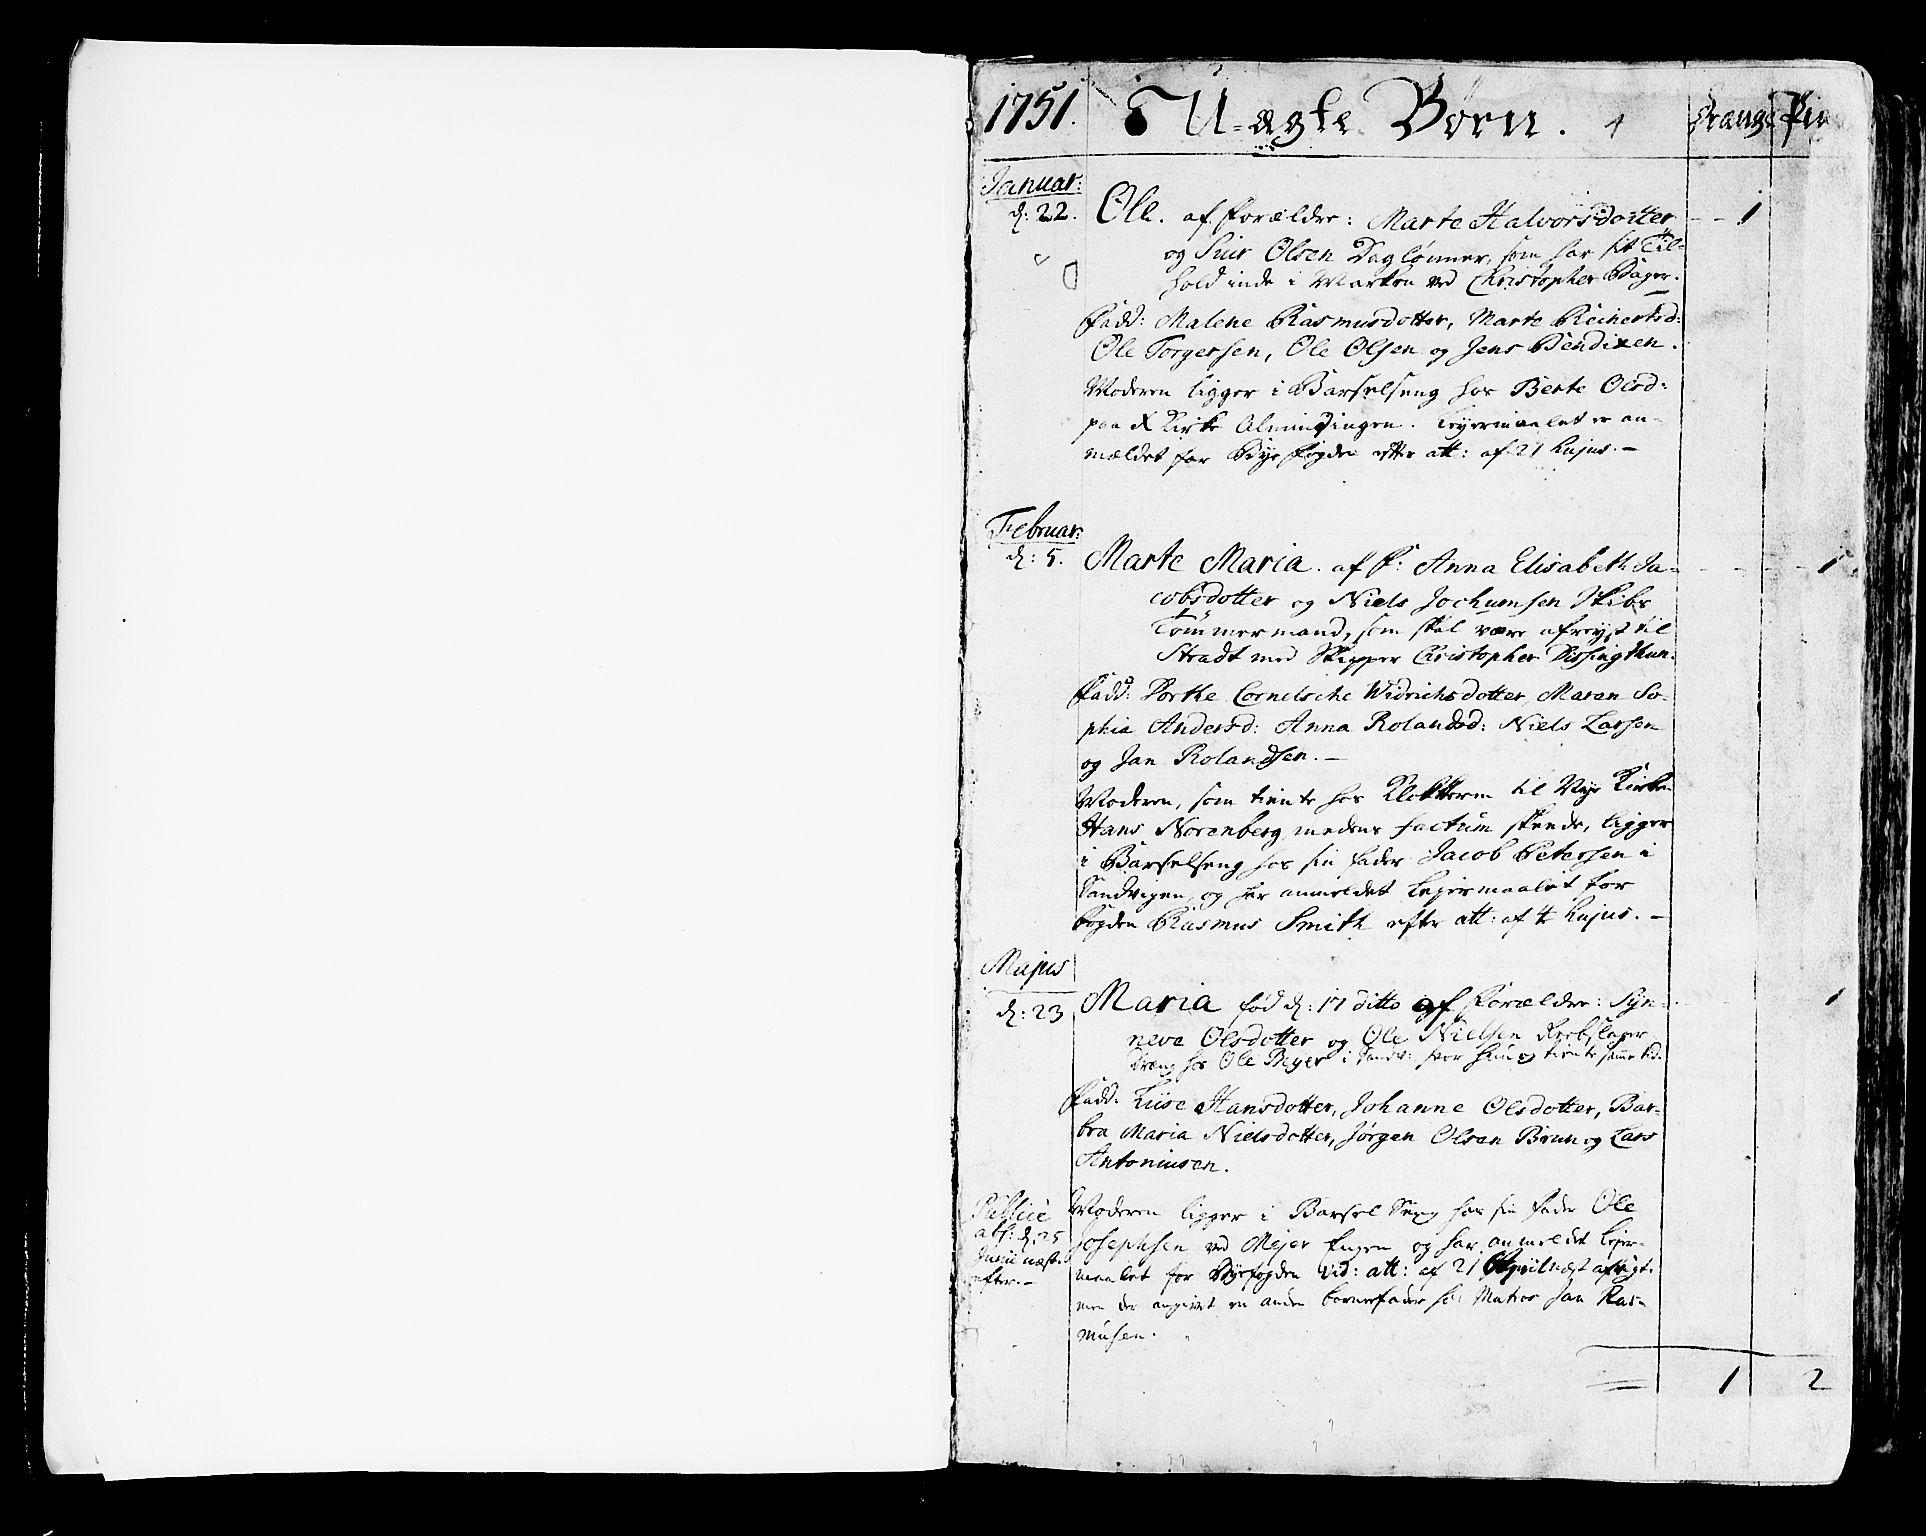 SAB, Korskirken Sokneprestembete, H/Haa/L0005: Ministerialbok nr. A 5, 1751-1789, s. 277